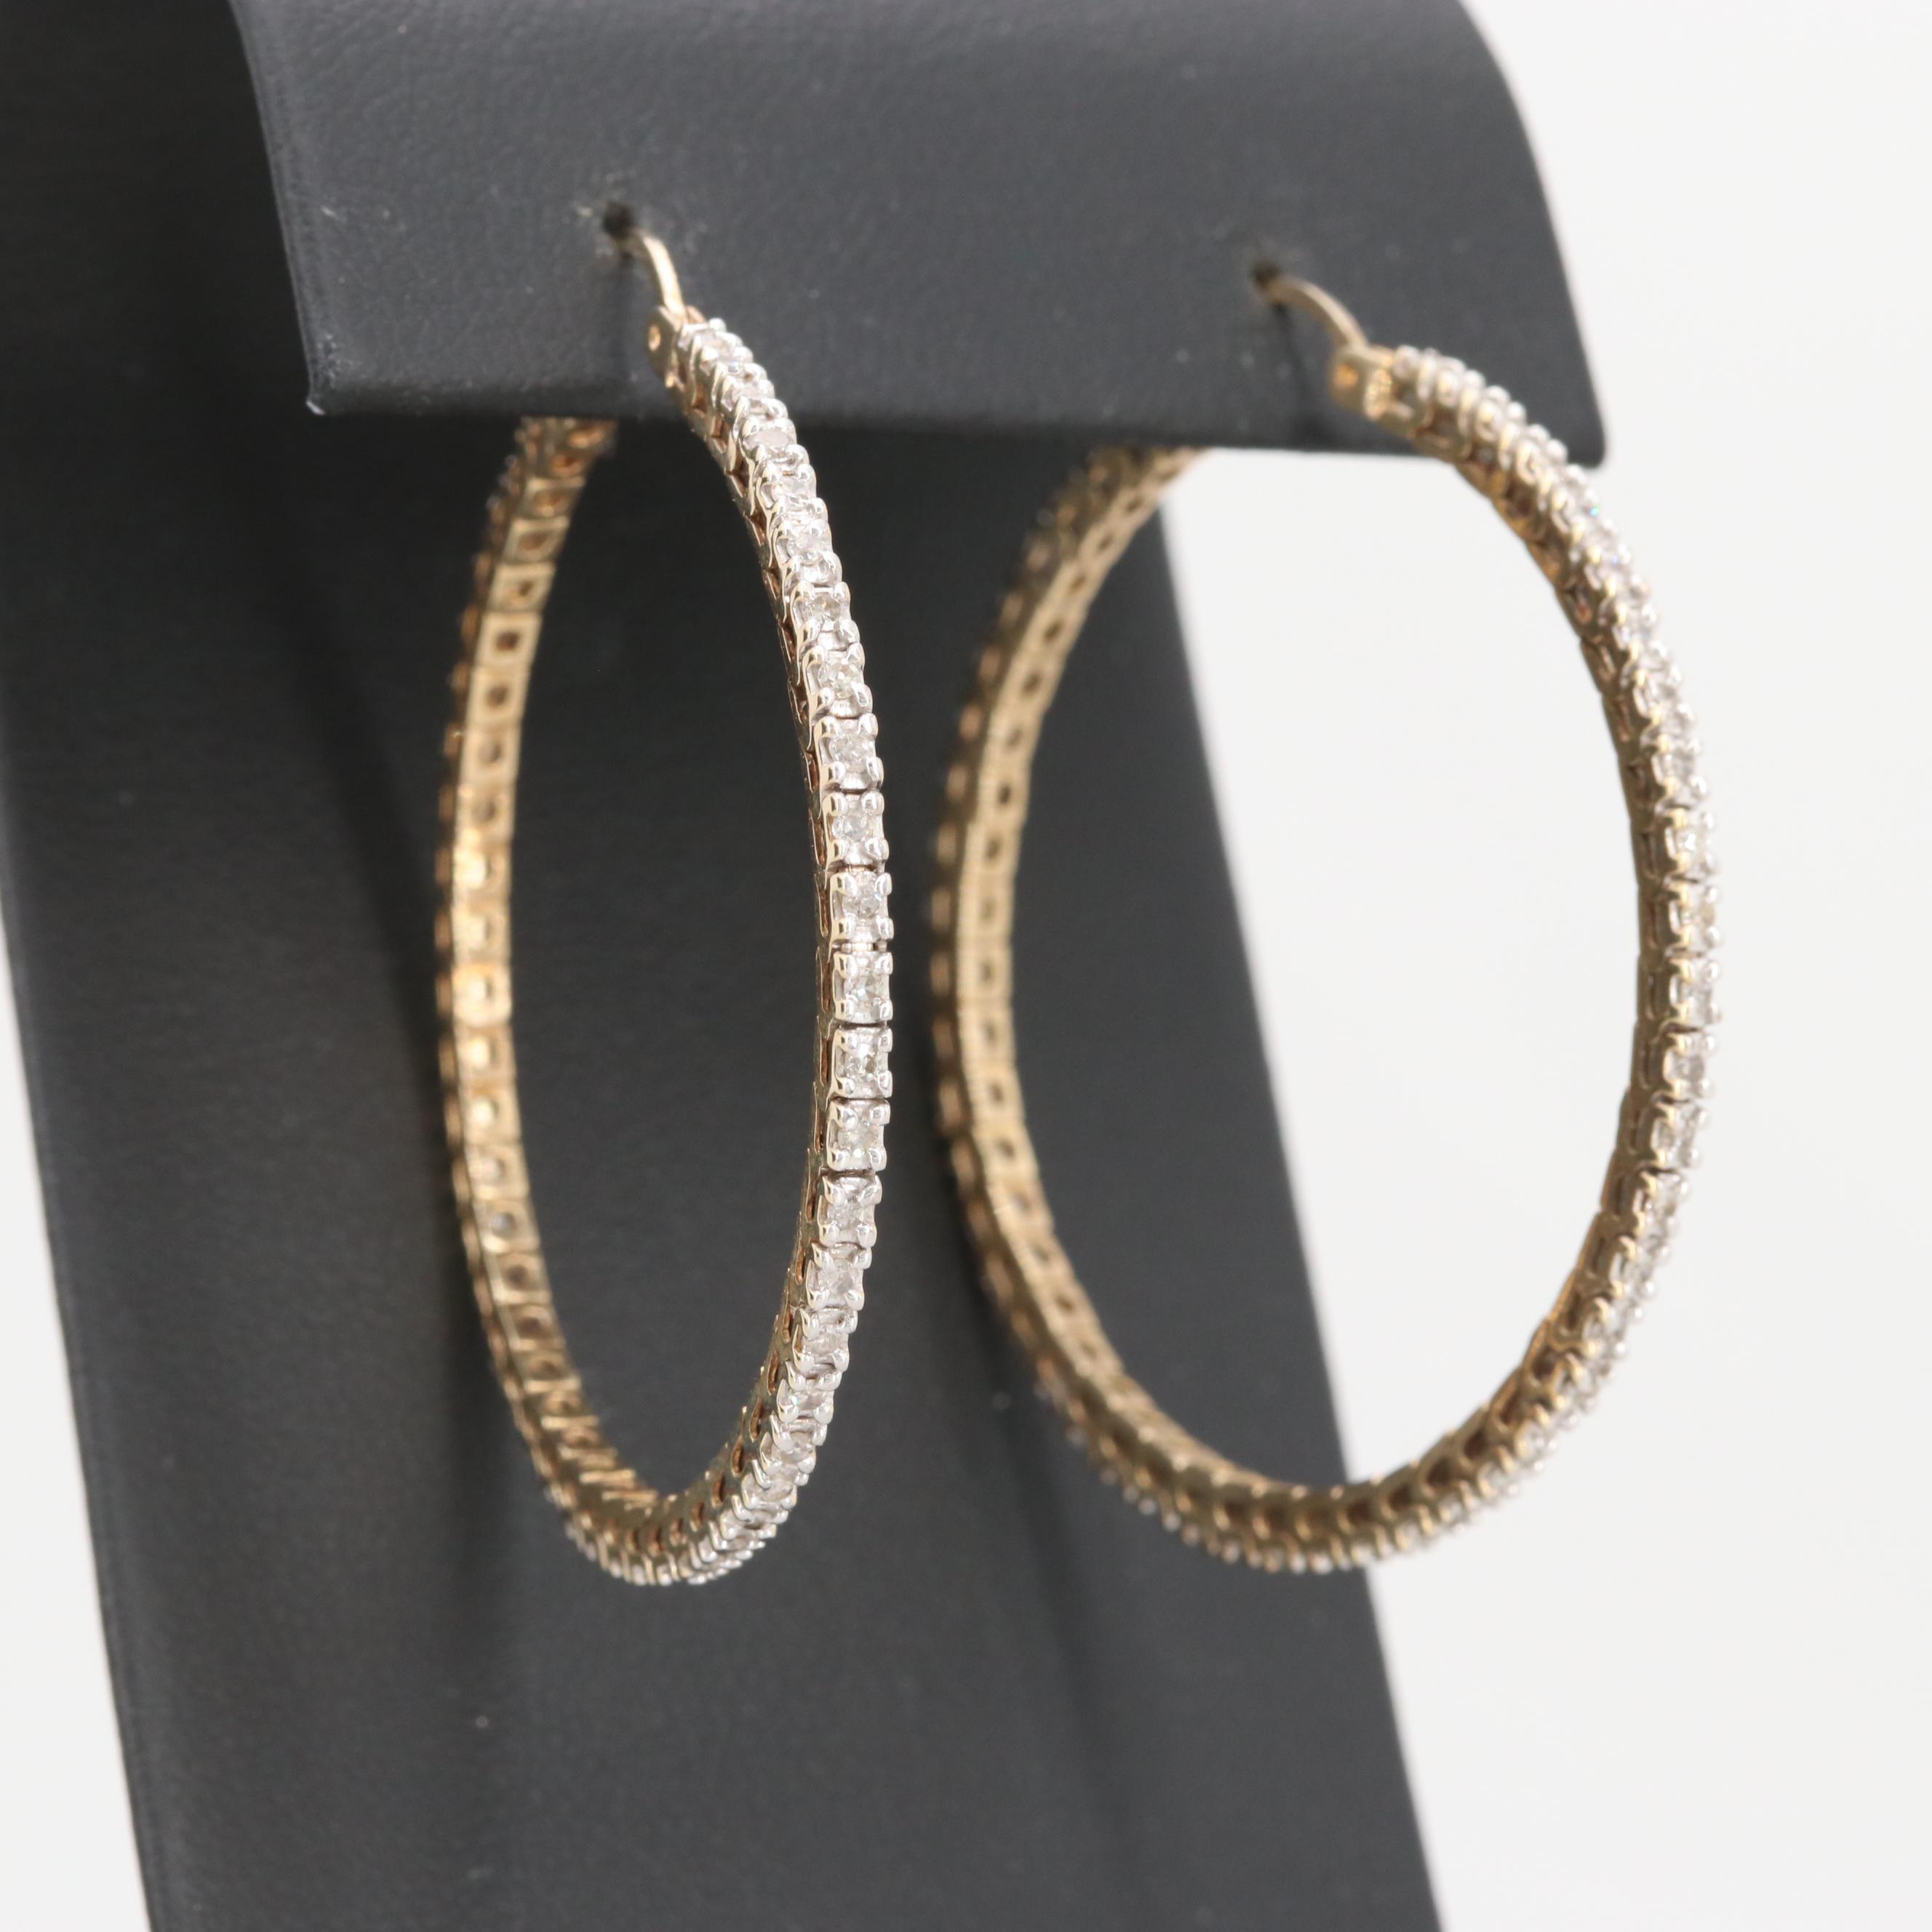 10K Yellow Gold 1.00 CTW Diamond Hoop Earrings